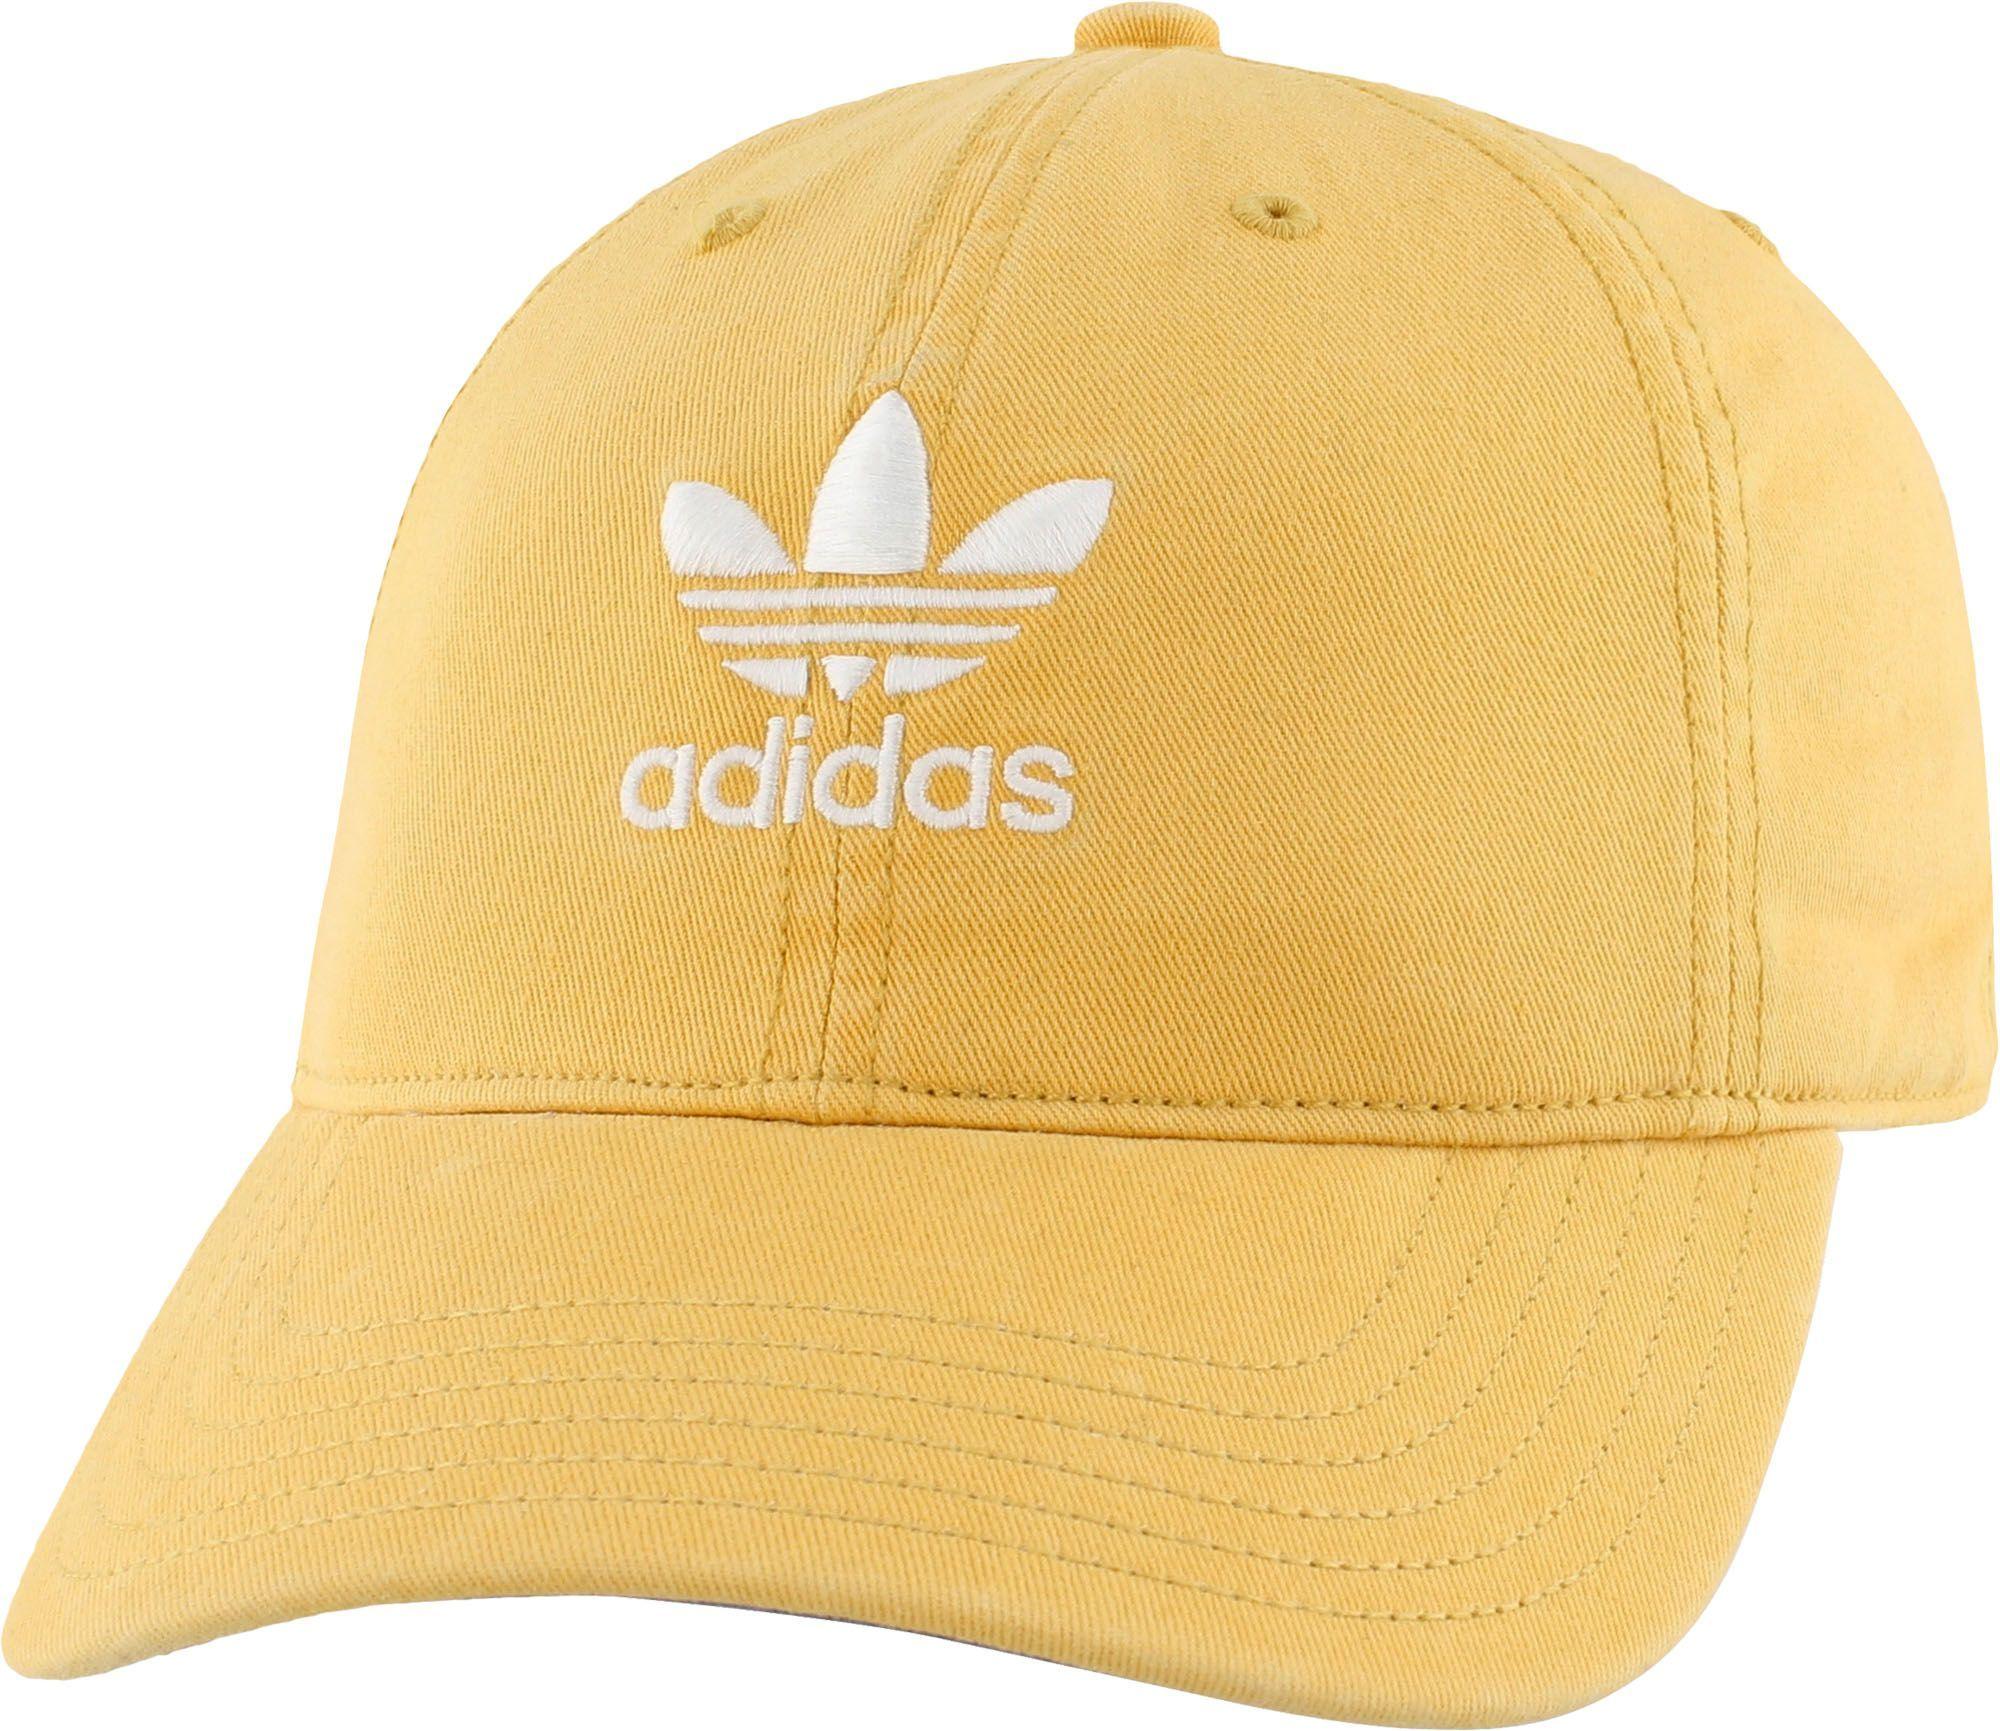 Adidas Originals Trefoil Yellow Mens Beanie Yello Cl5306 Yellow Adidas Yellow Beanie Mens Beanie